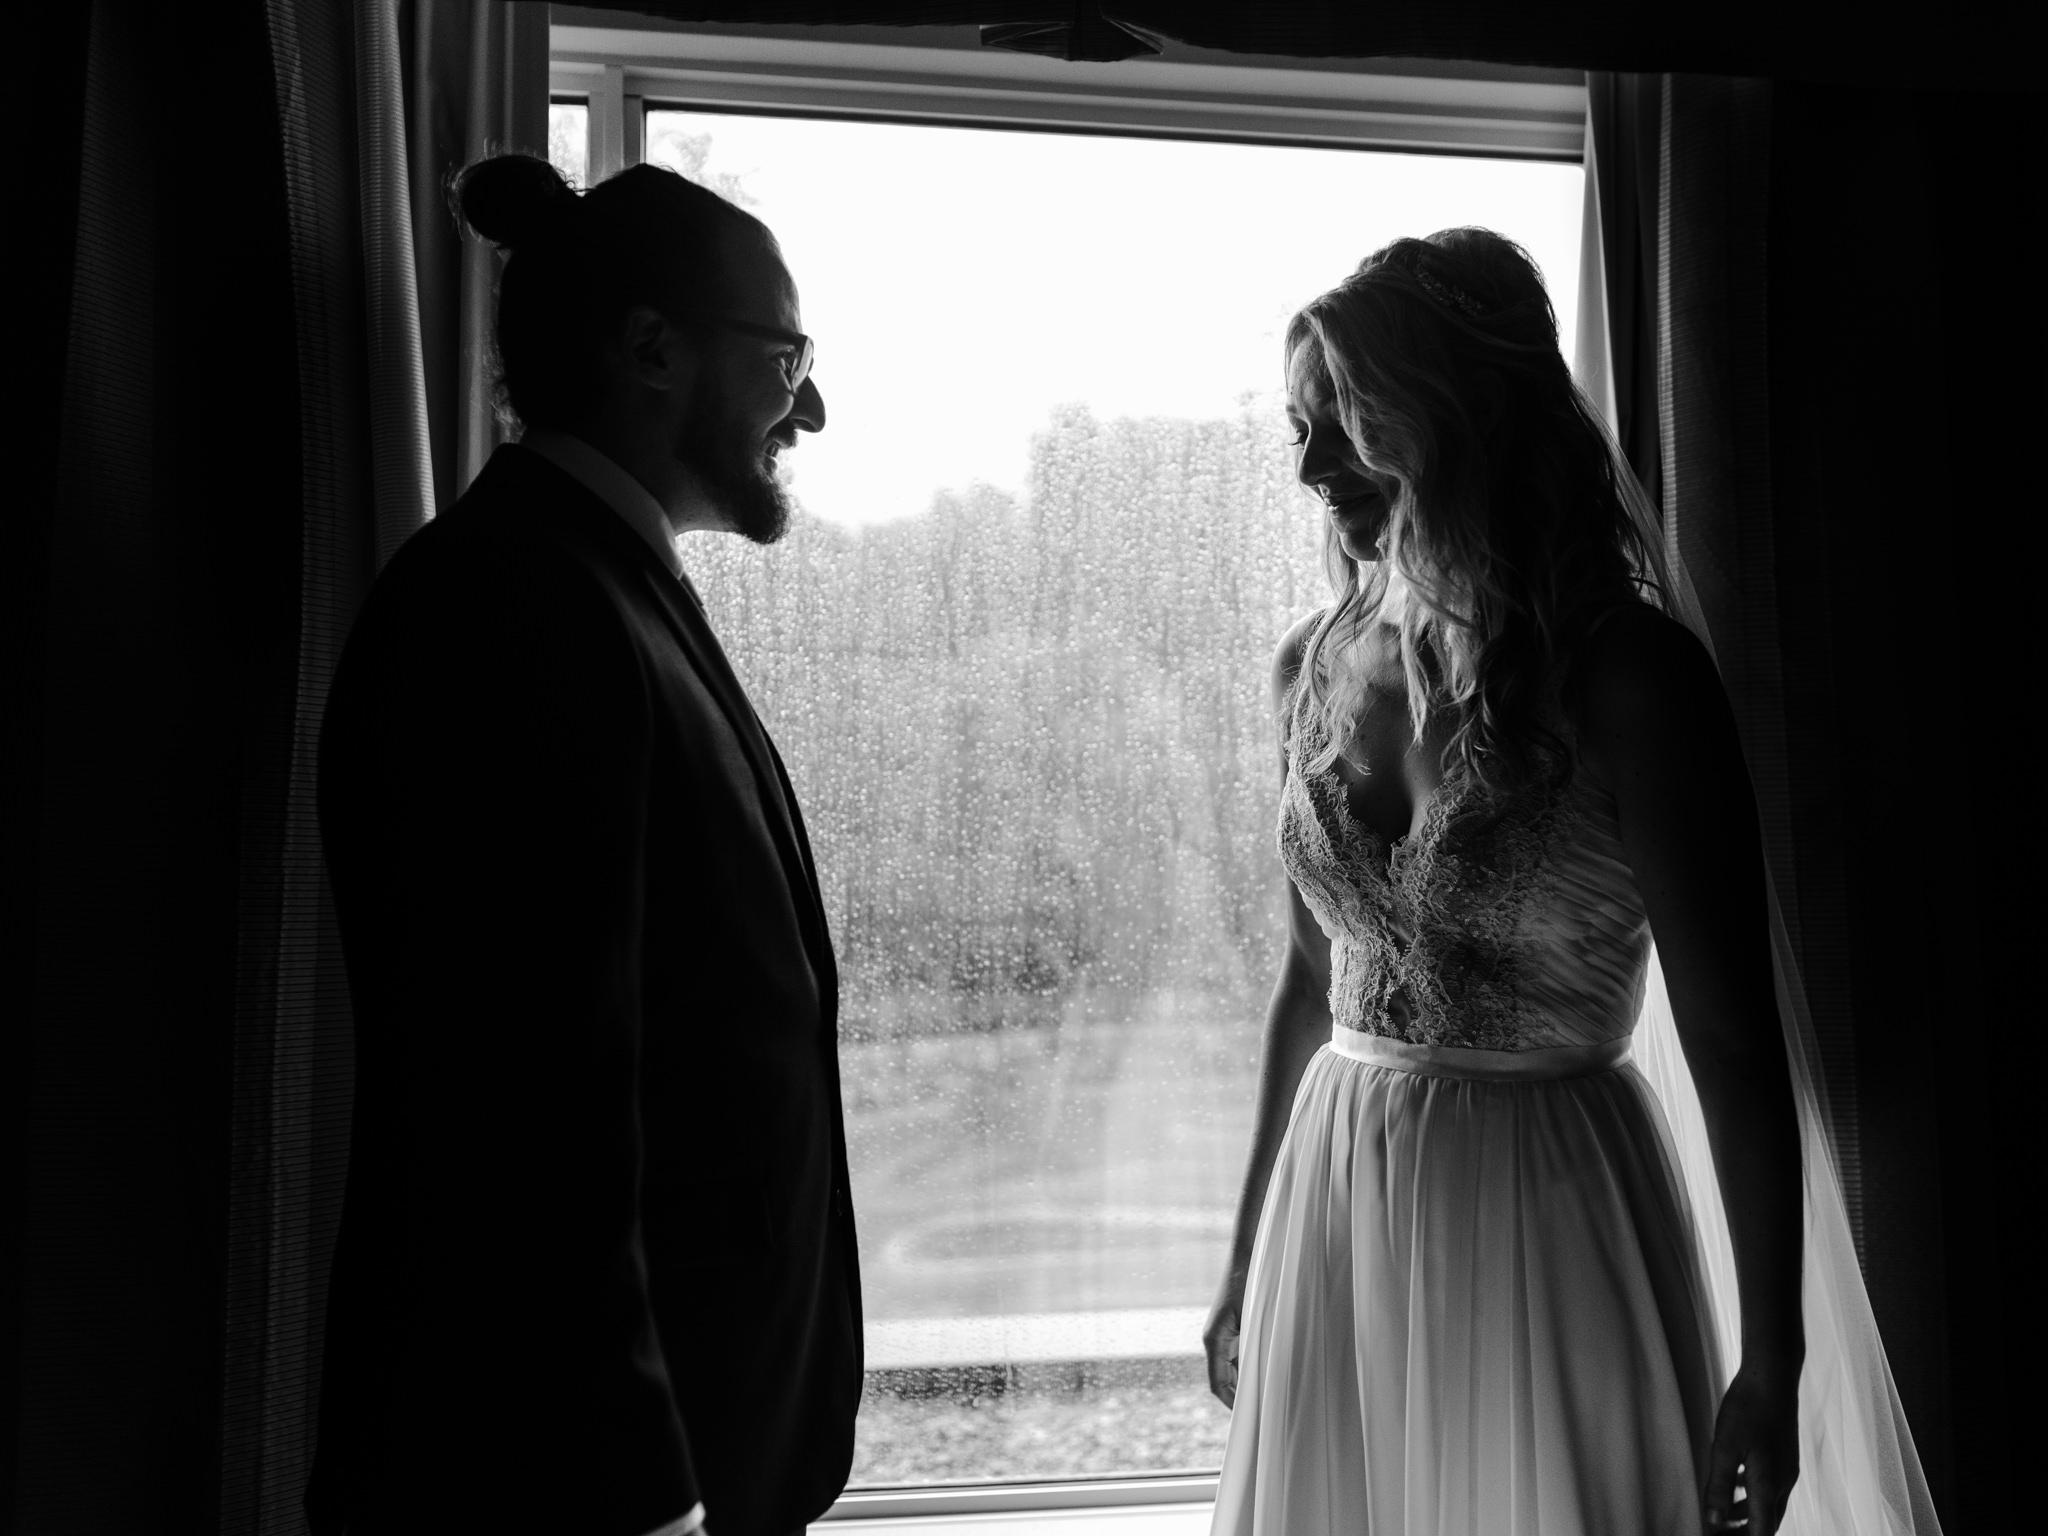 skyloft-wedding-toronto-wedding-photographer-12.jpg